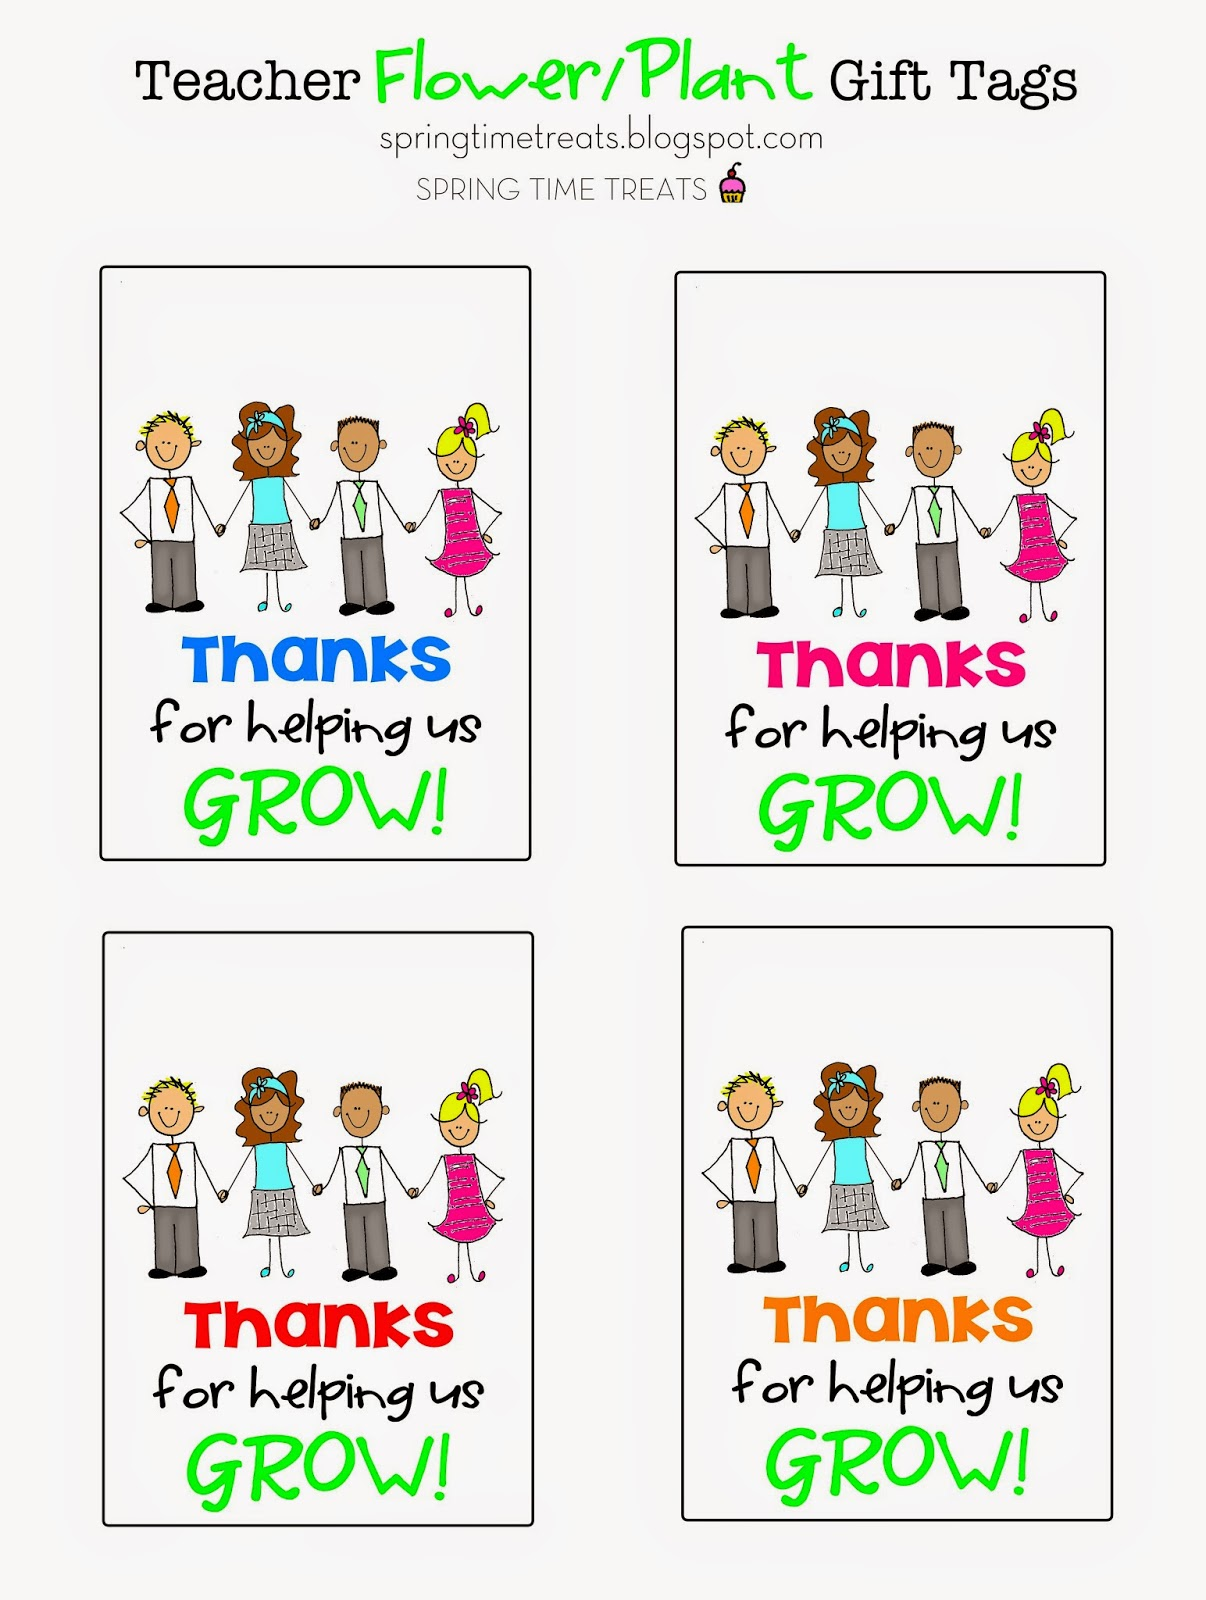 Spring Time Treats Free Teacher Appreciation Printables